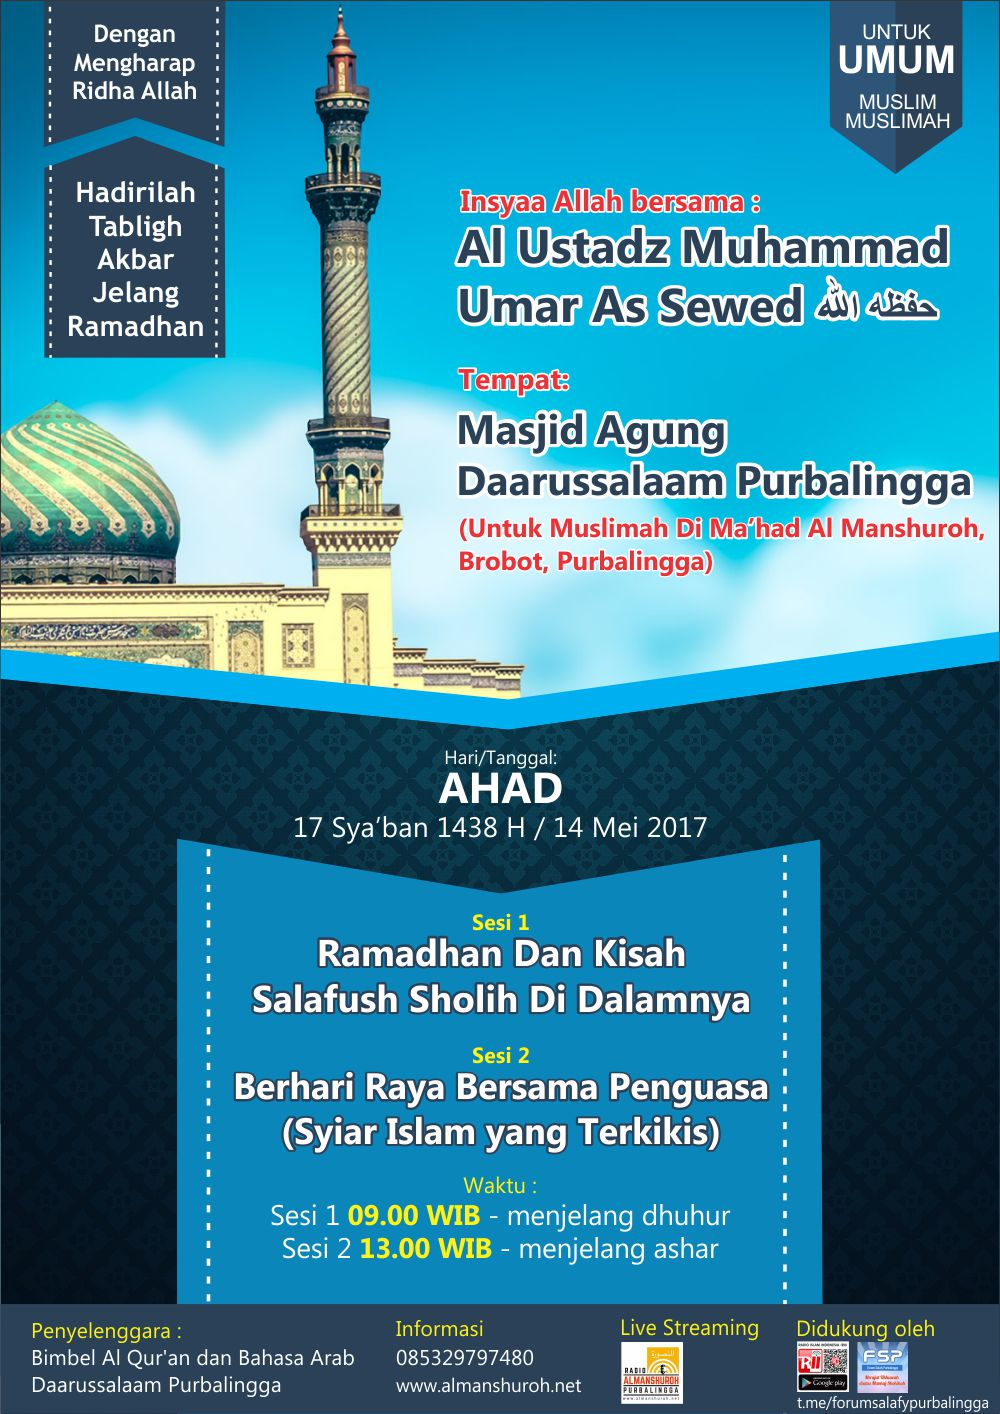 TABLIGH AKBAR JELANG ROMADHON 1438 H – Ustadz Muhammad Umar Assewed